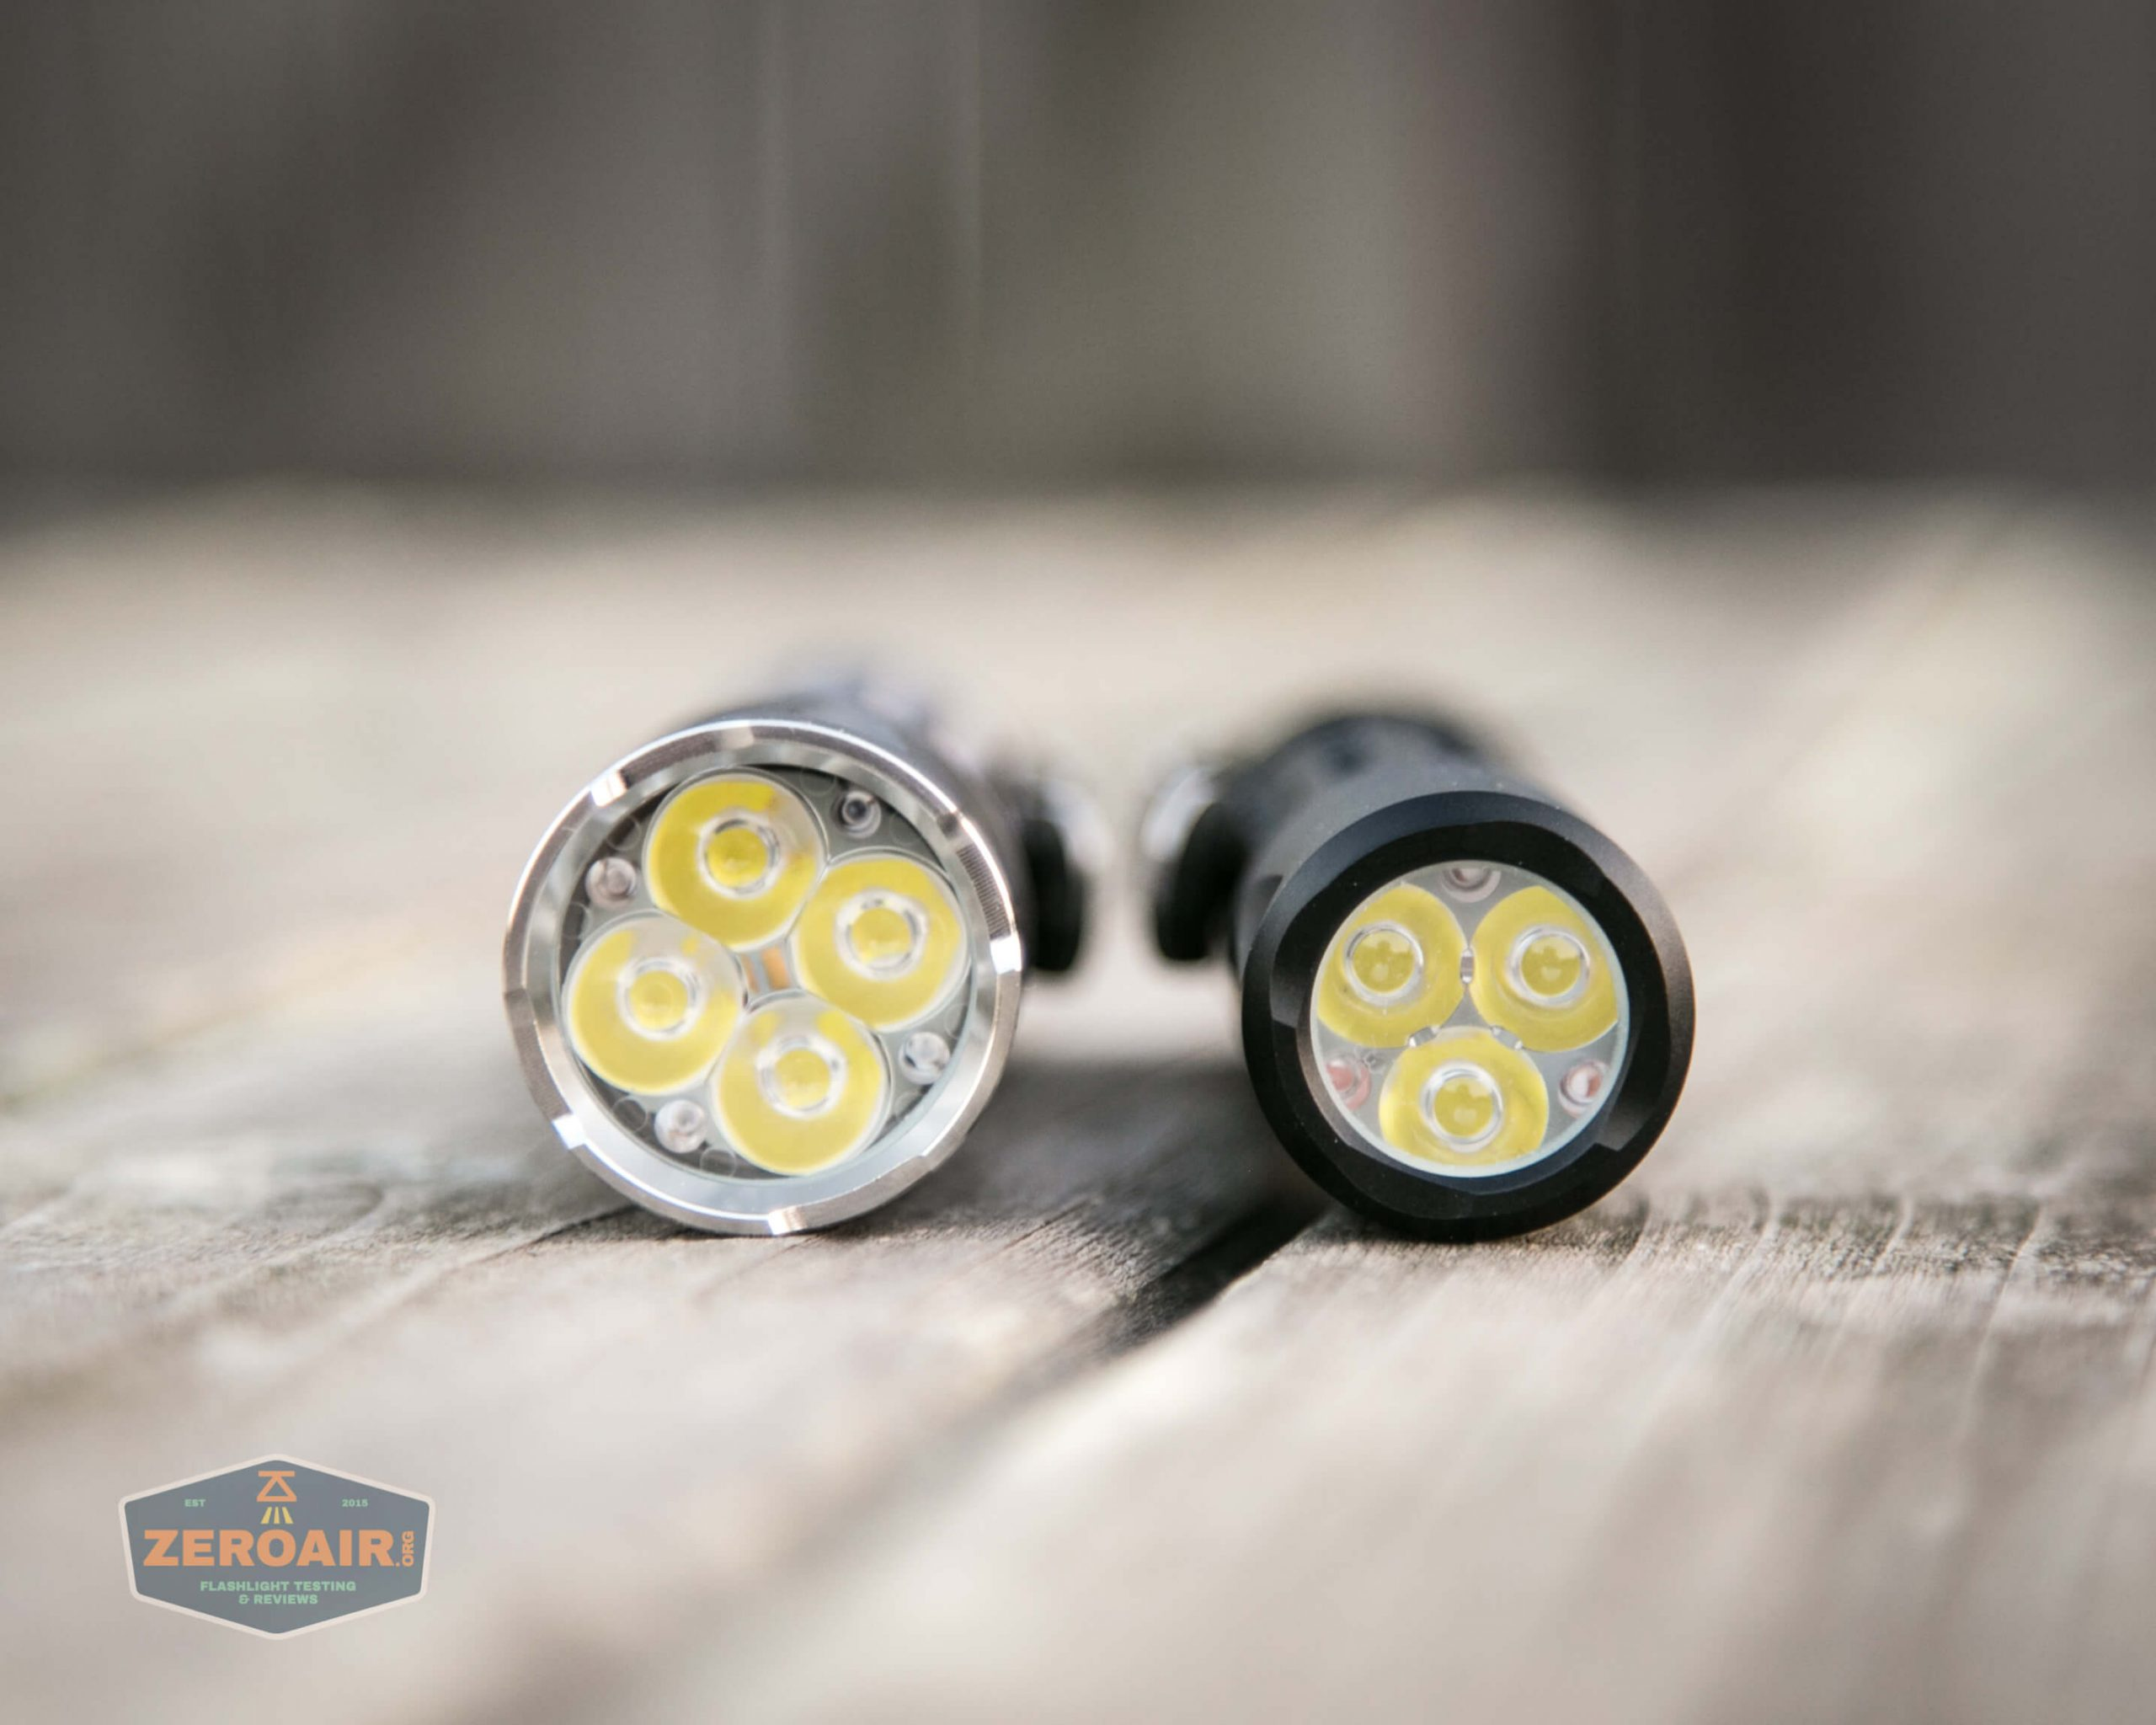 countycomm reylight 21700 quad emitter flashlight beside reylight triple